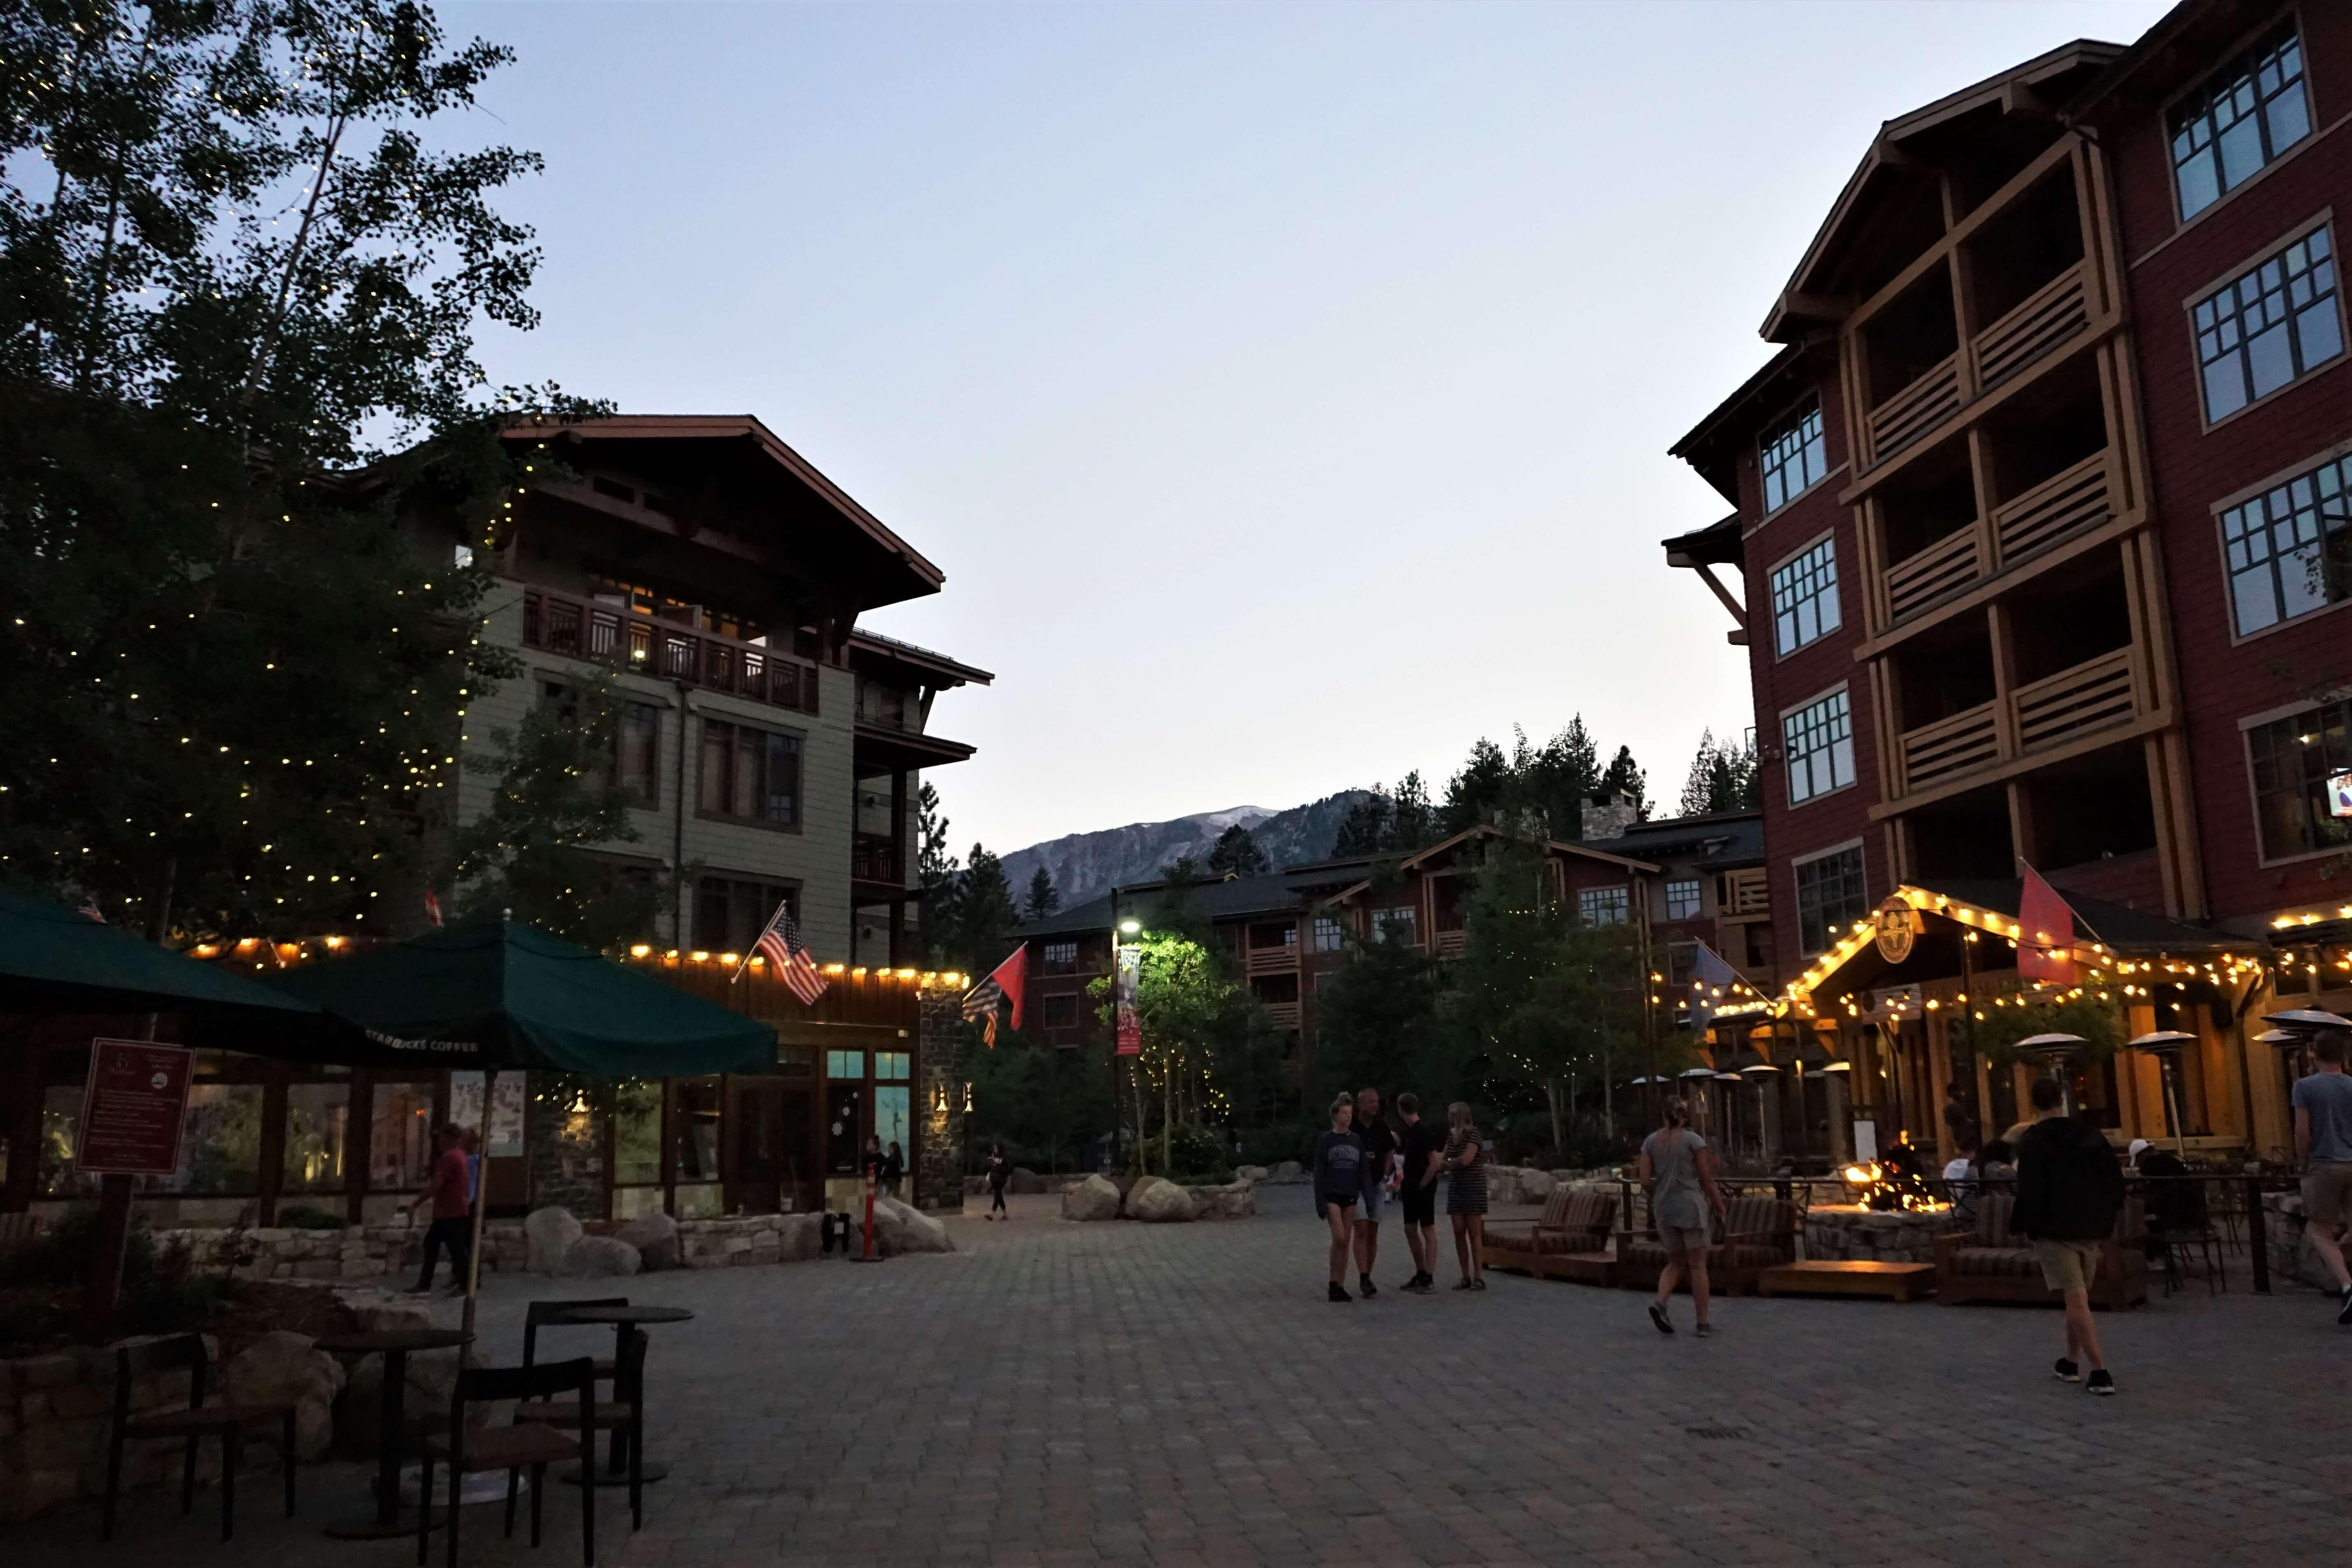 The Village Lodge at night